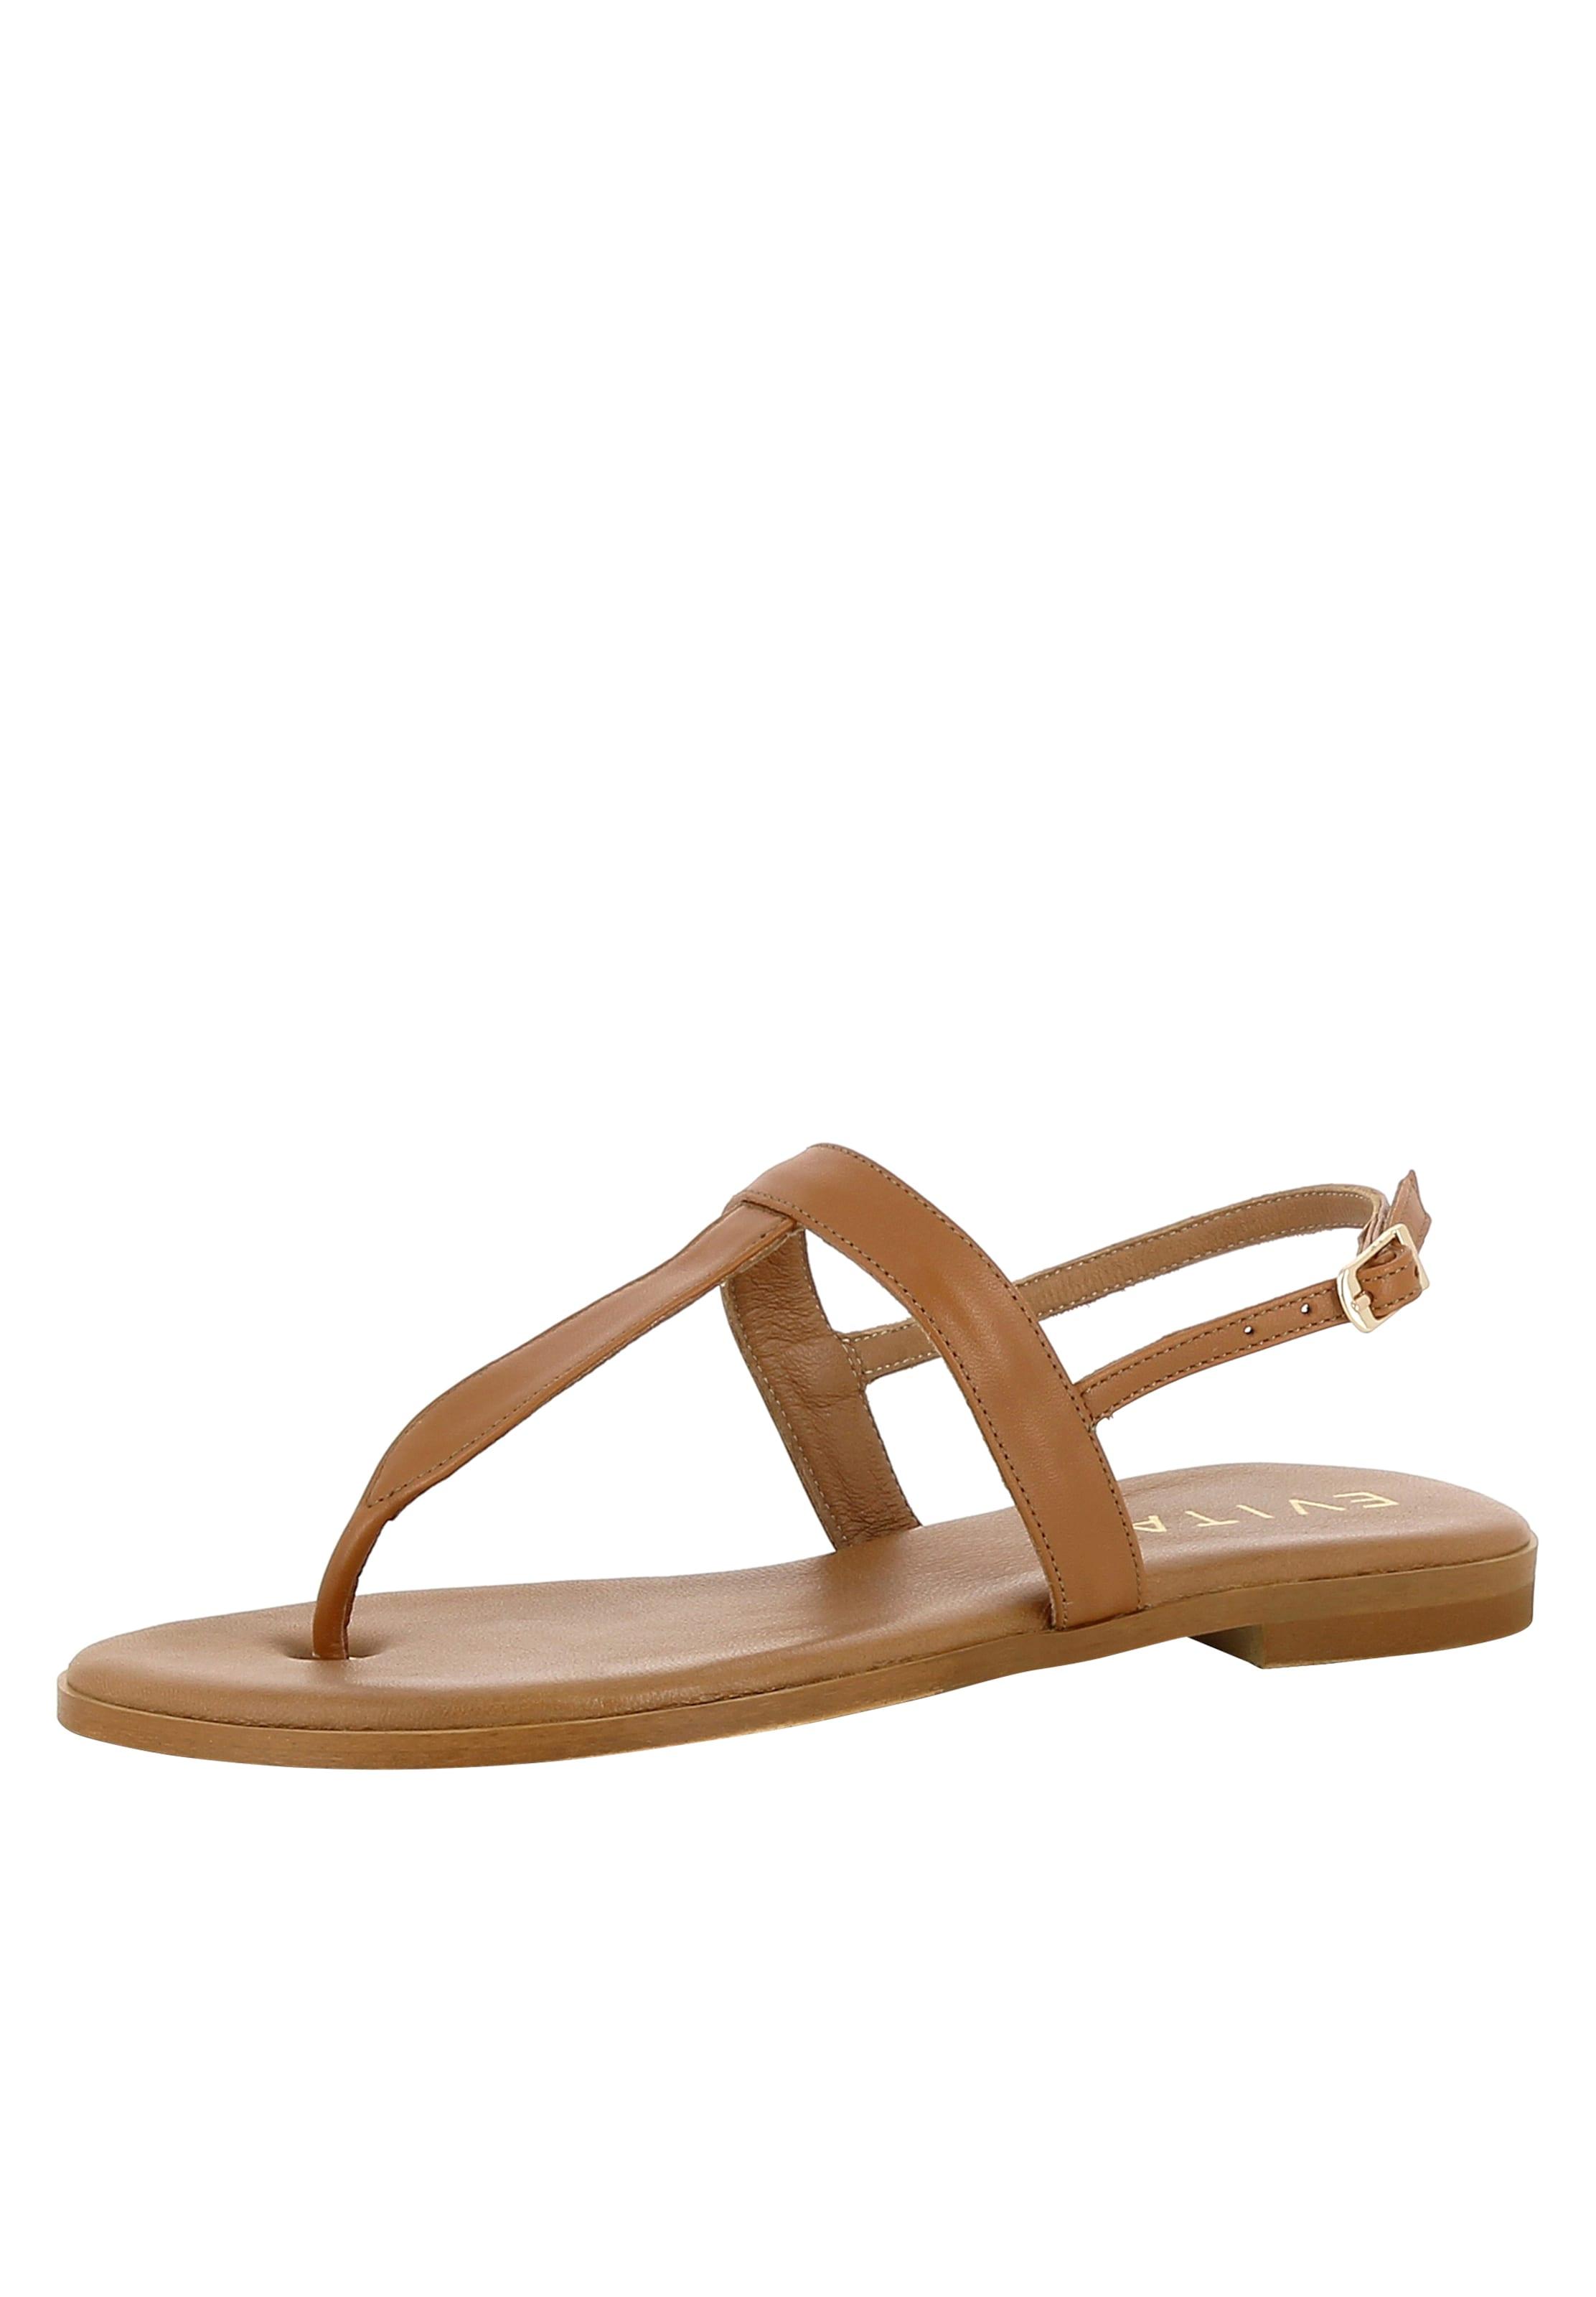 Sandale 'olimpia' 'olimpia' In 'olimpia' Braun Sandale In Evita Evita Evita Sandale In Braun dCrxWEeBQo